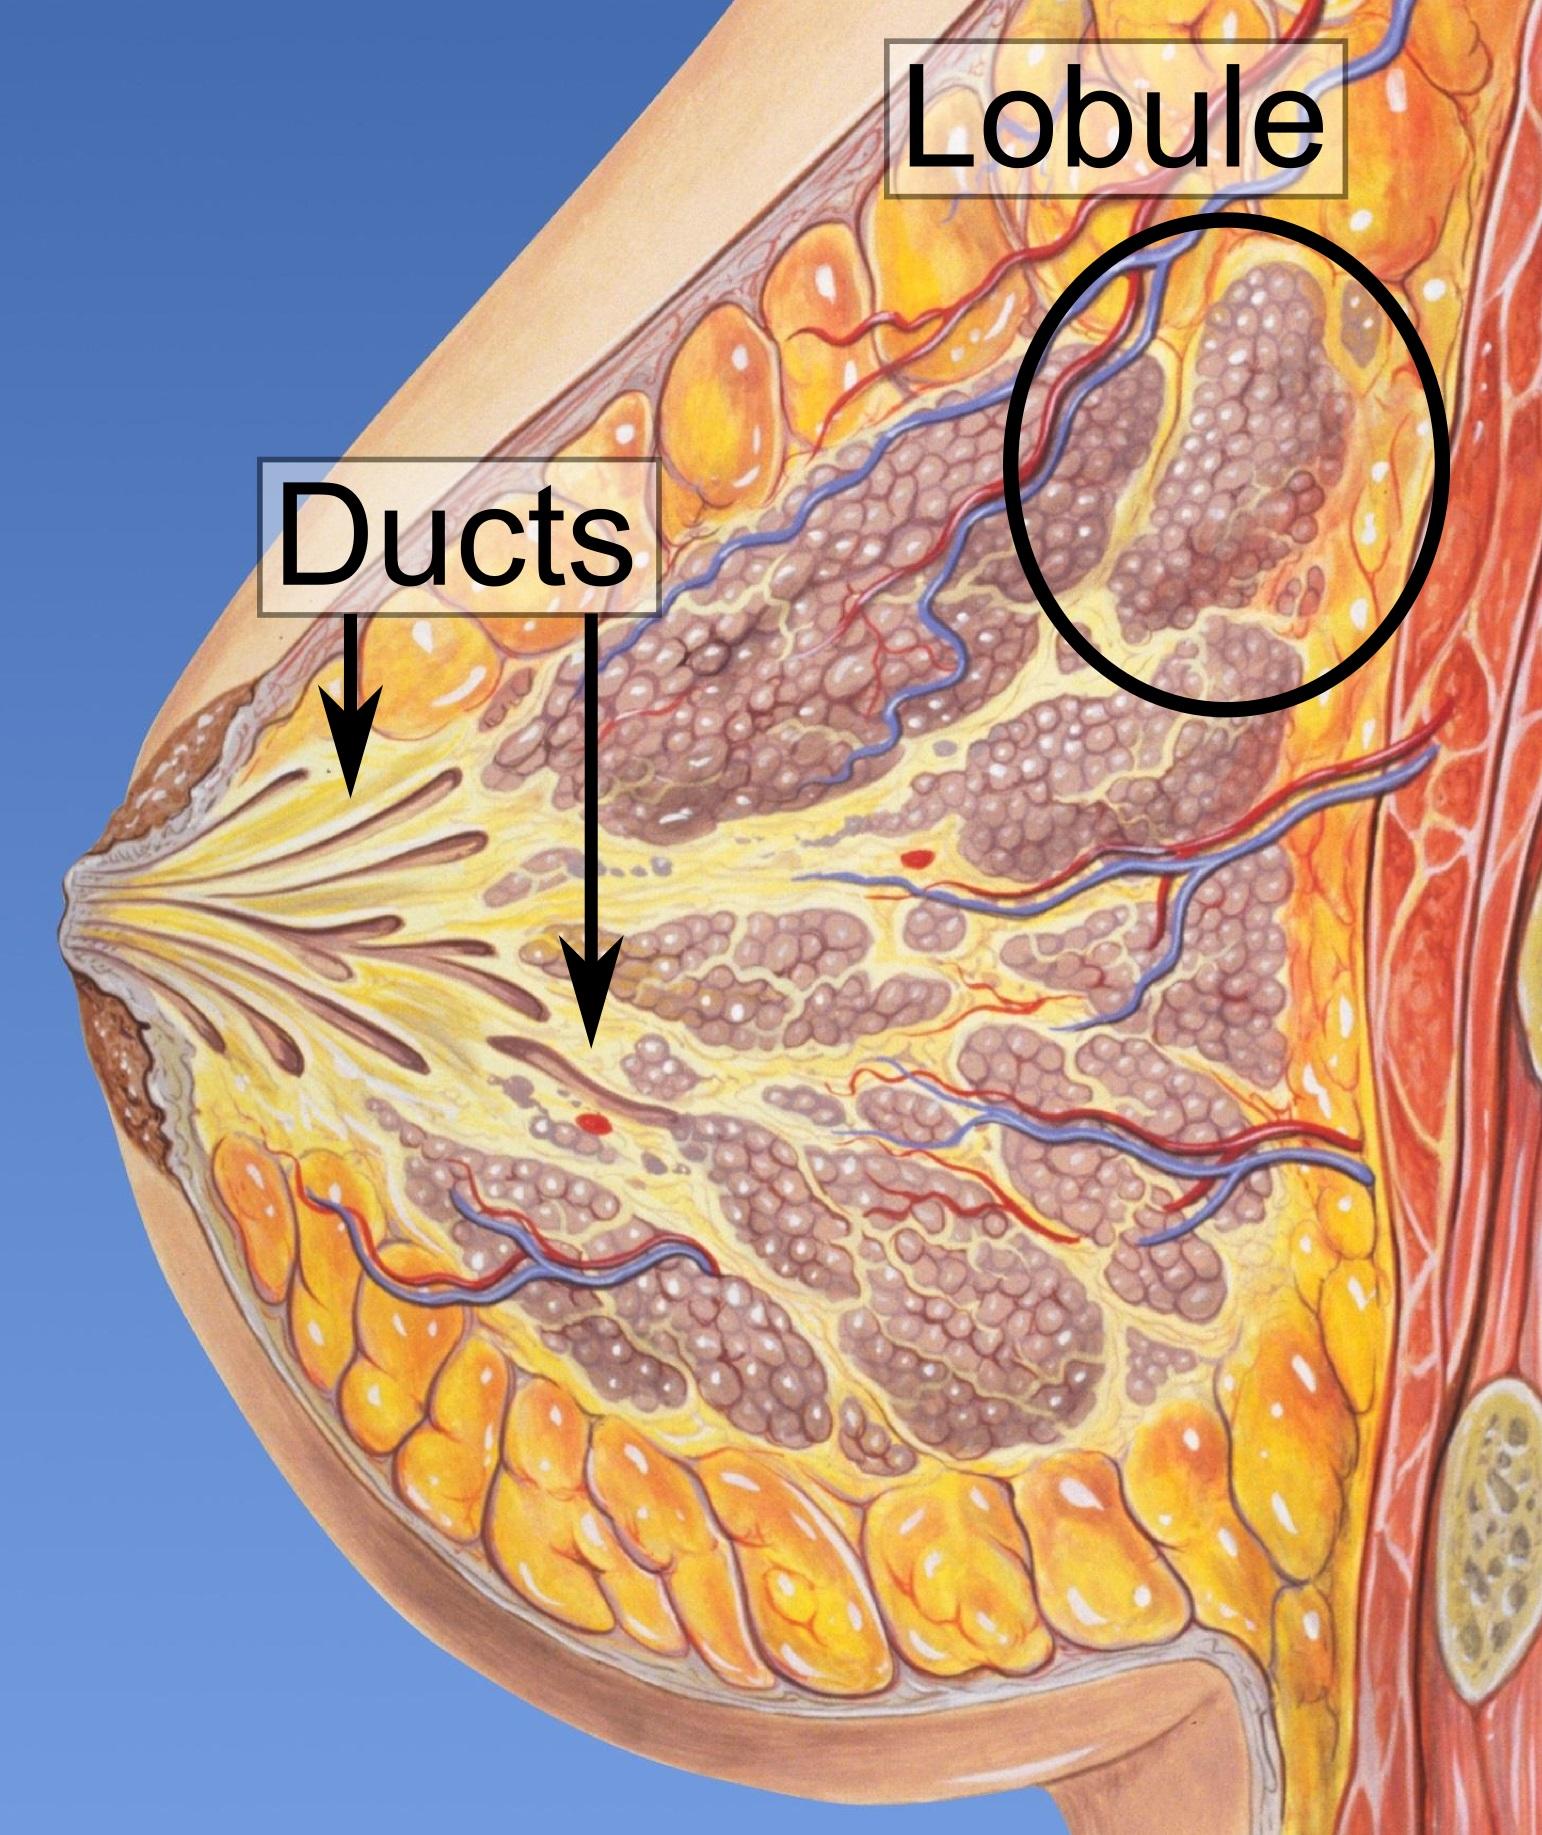 Kode icd 10 papillomatosis, Icd 10 code for papilloma right breast